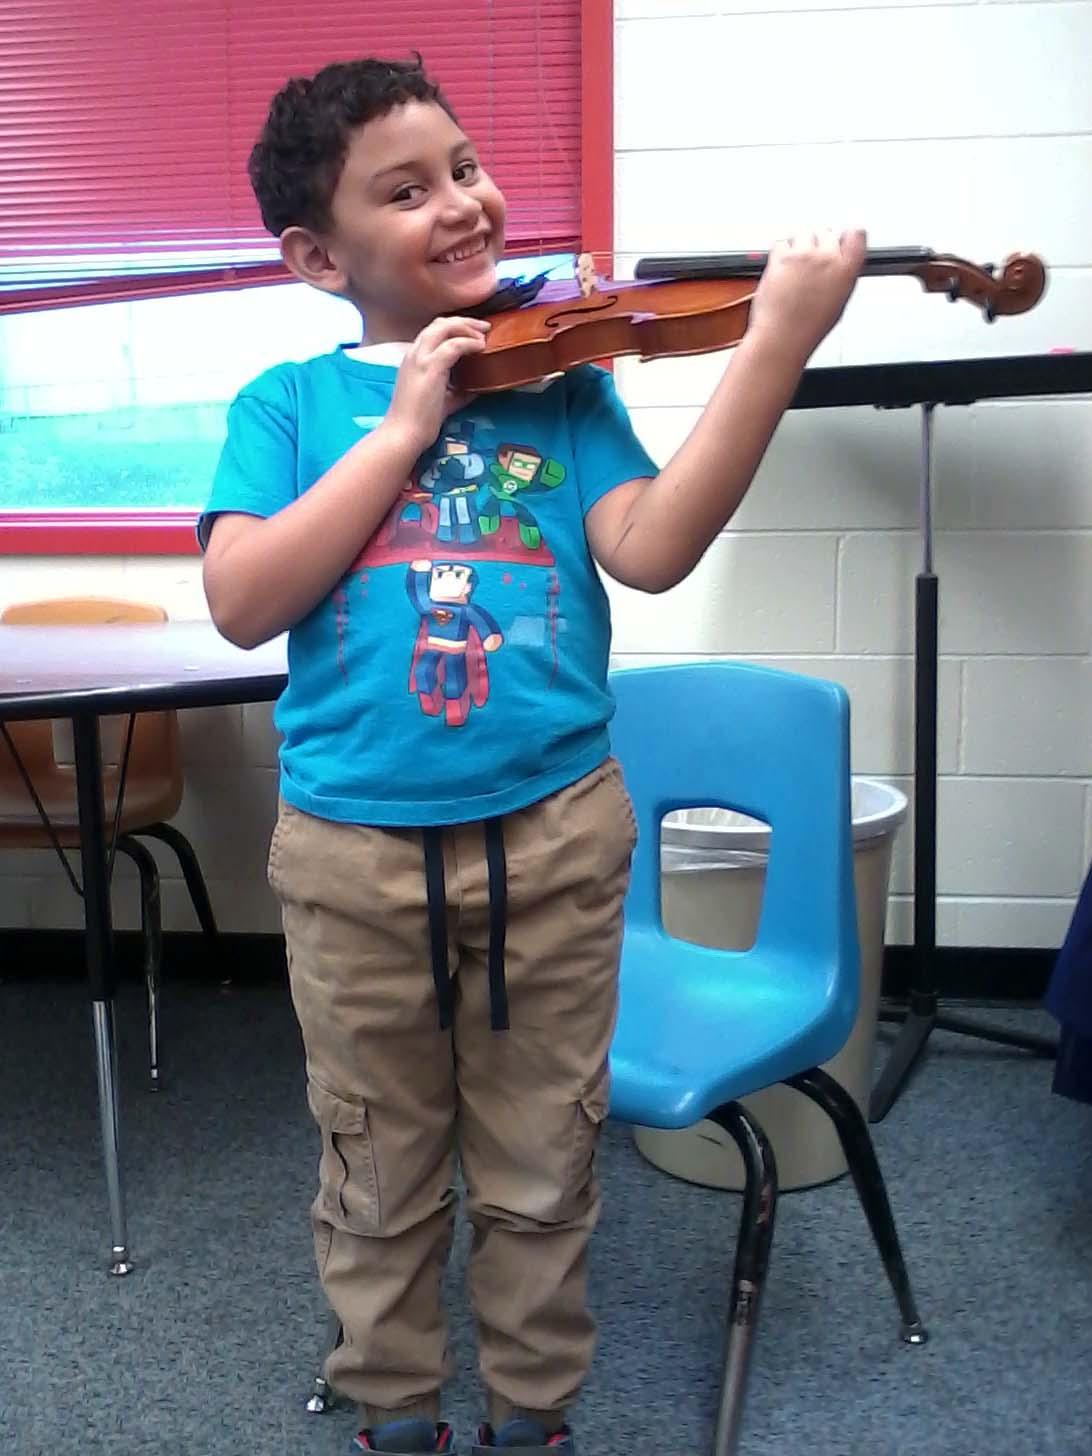 ethan-on-violin